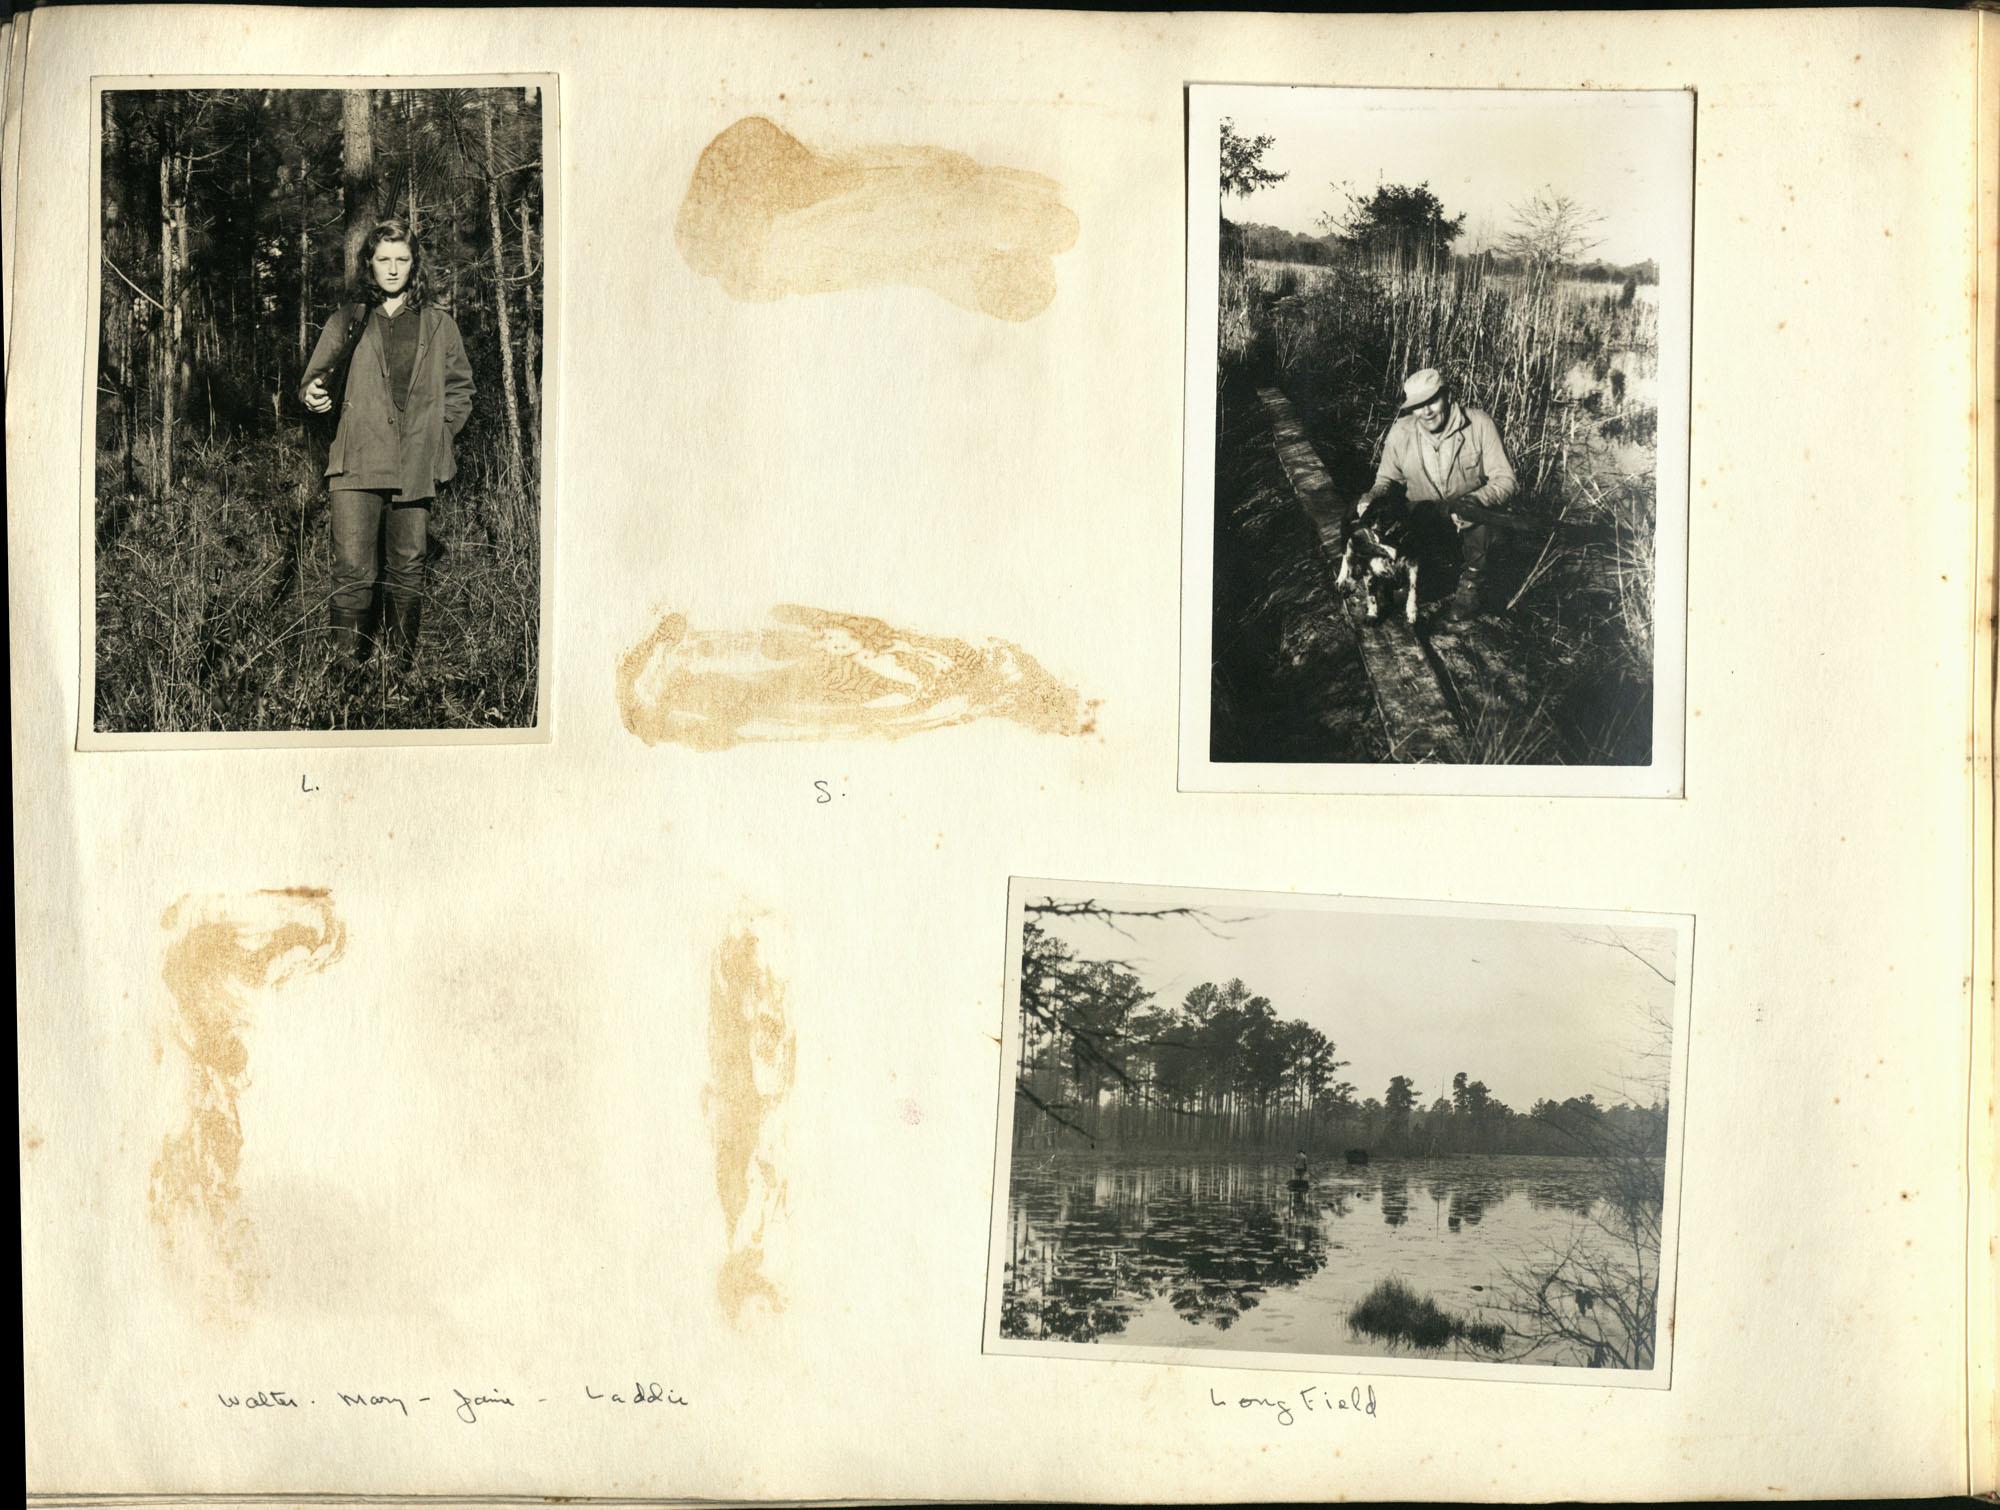 Medway Plantation Photograph Album, 1949, page 134